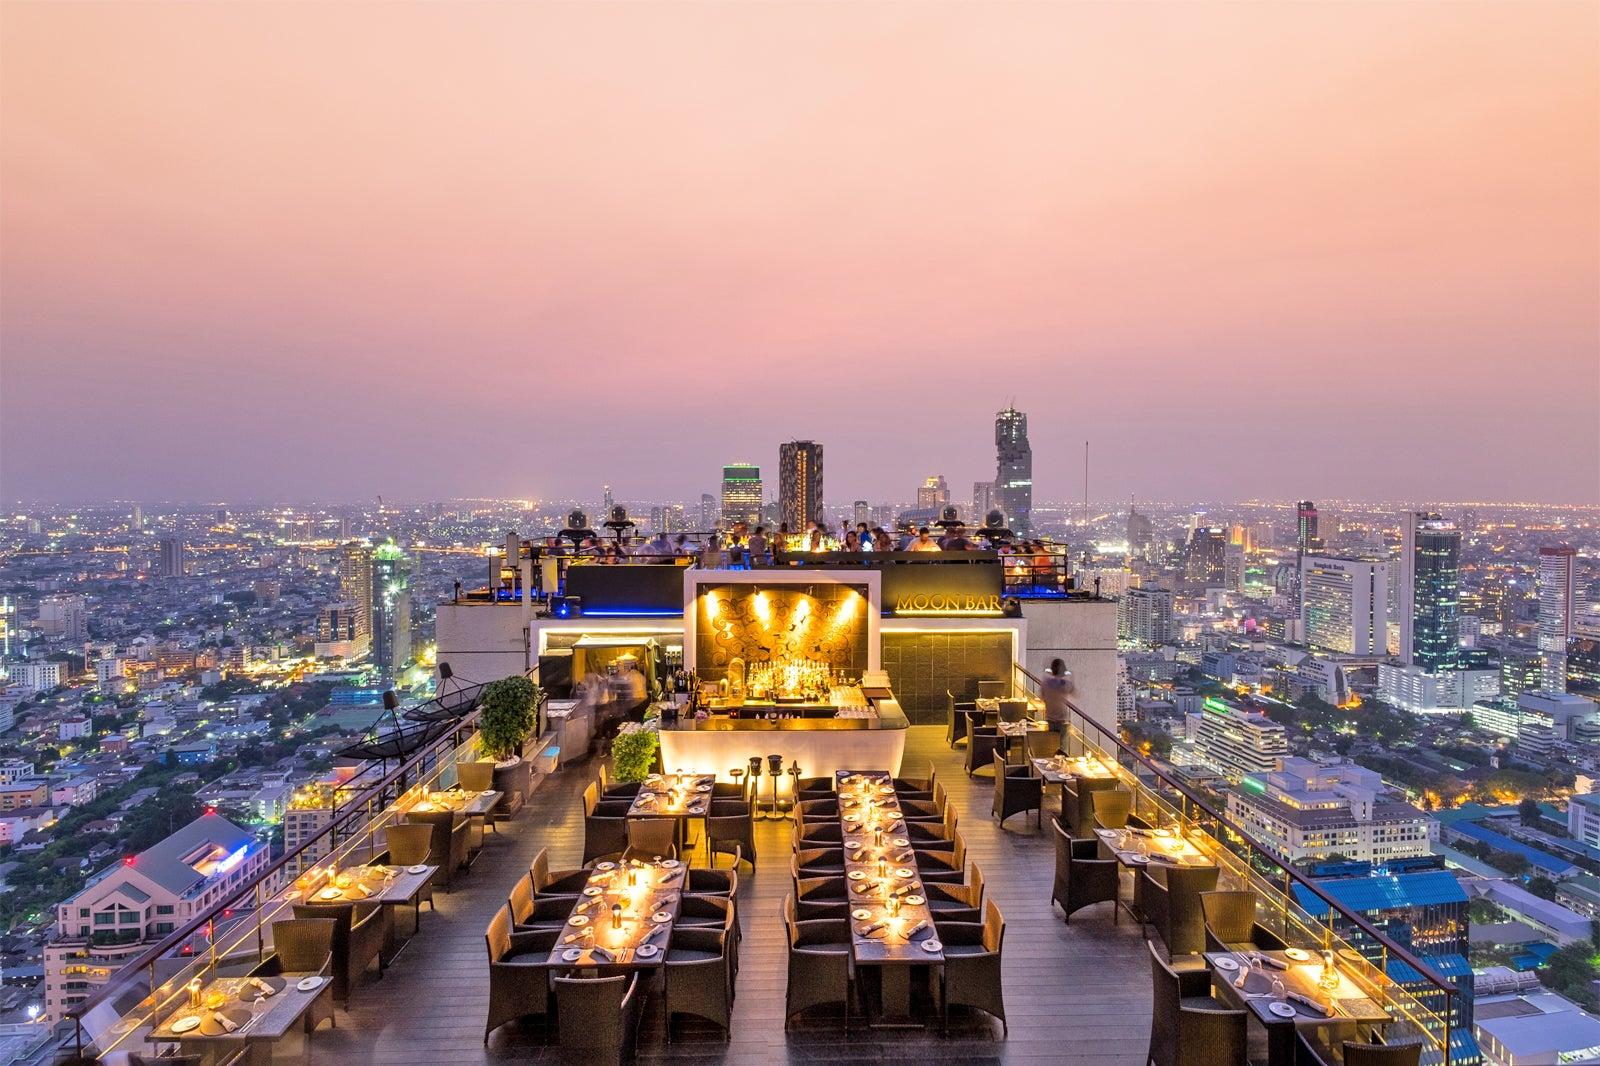 21 Best Rooftop Bars in Bangkok - Bangkok's Best Nightlife